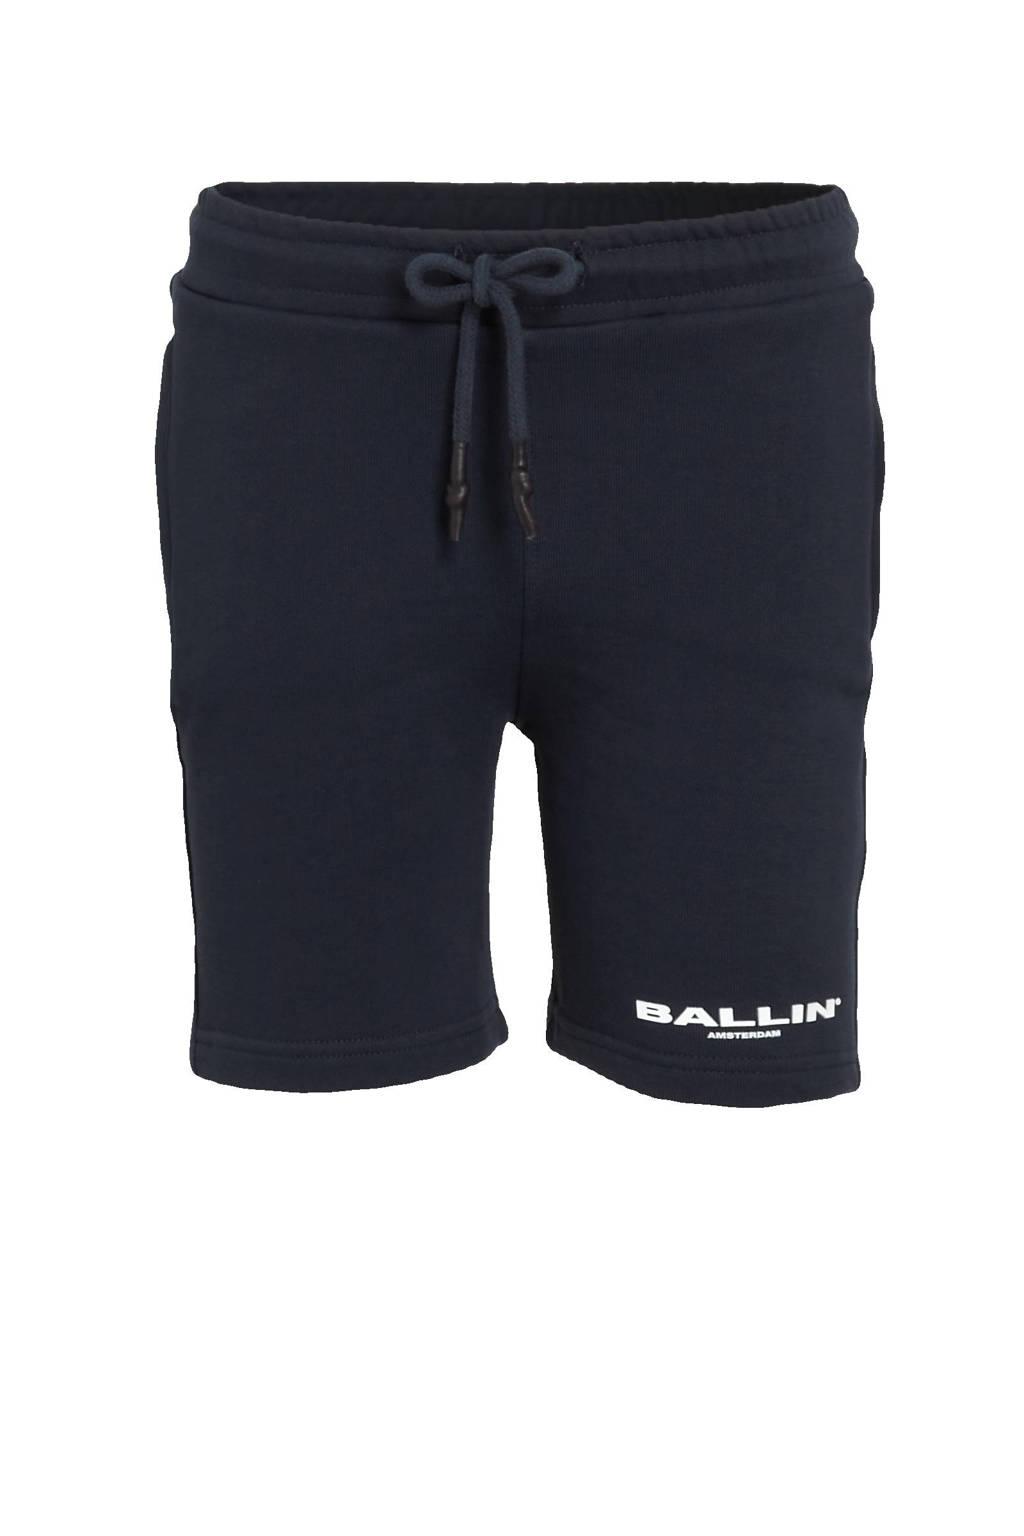 Ballin skinny sweatshort met logo donkerblauw, Donkerblauw